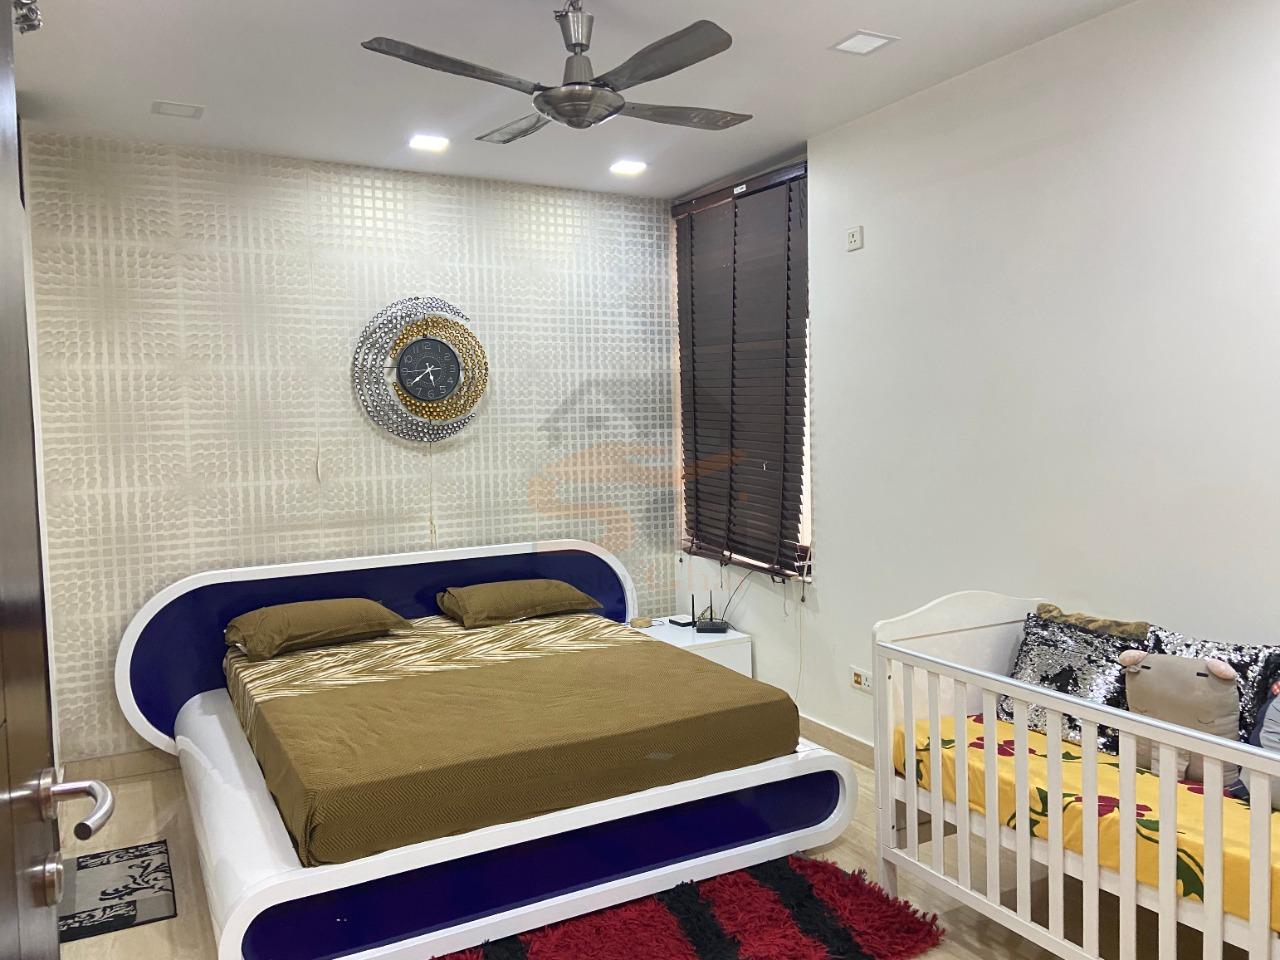 Luxurious 3 BHK flats in Vasant Kunj Image